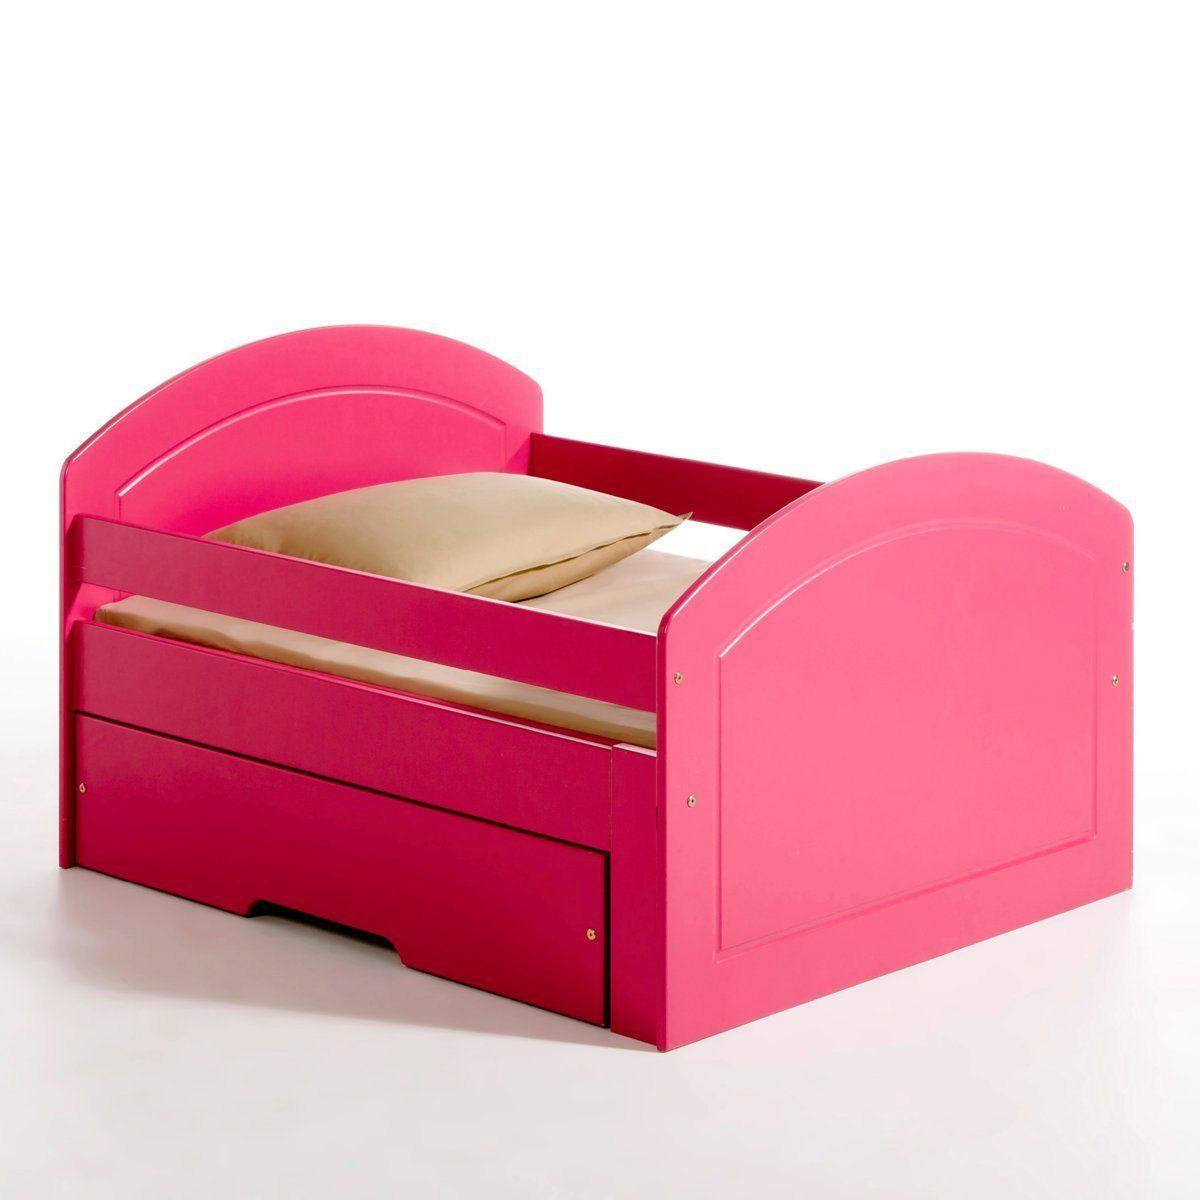 lit enfant extensible 3 positions en pin massif toudou. Black Bedroom Furniture Sets. Home Design Ideas